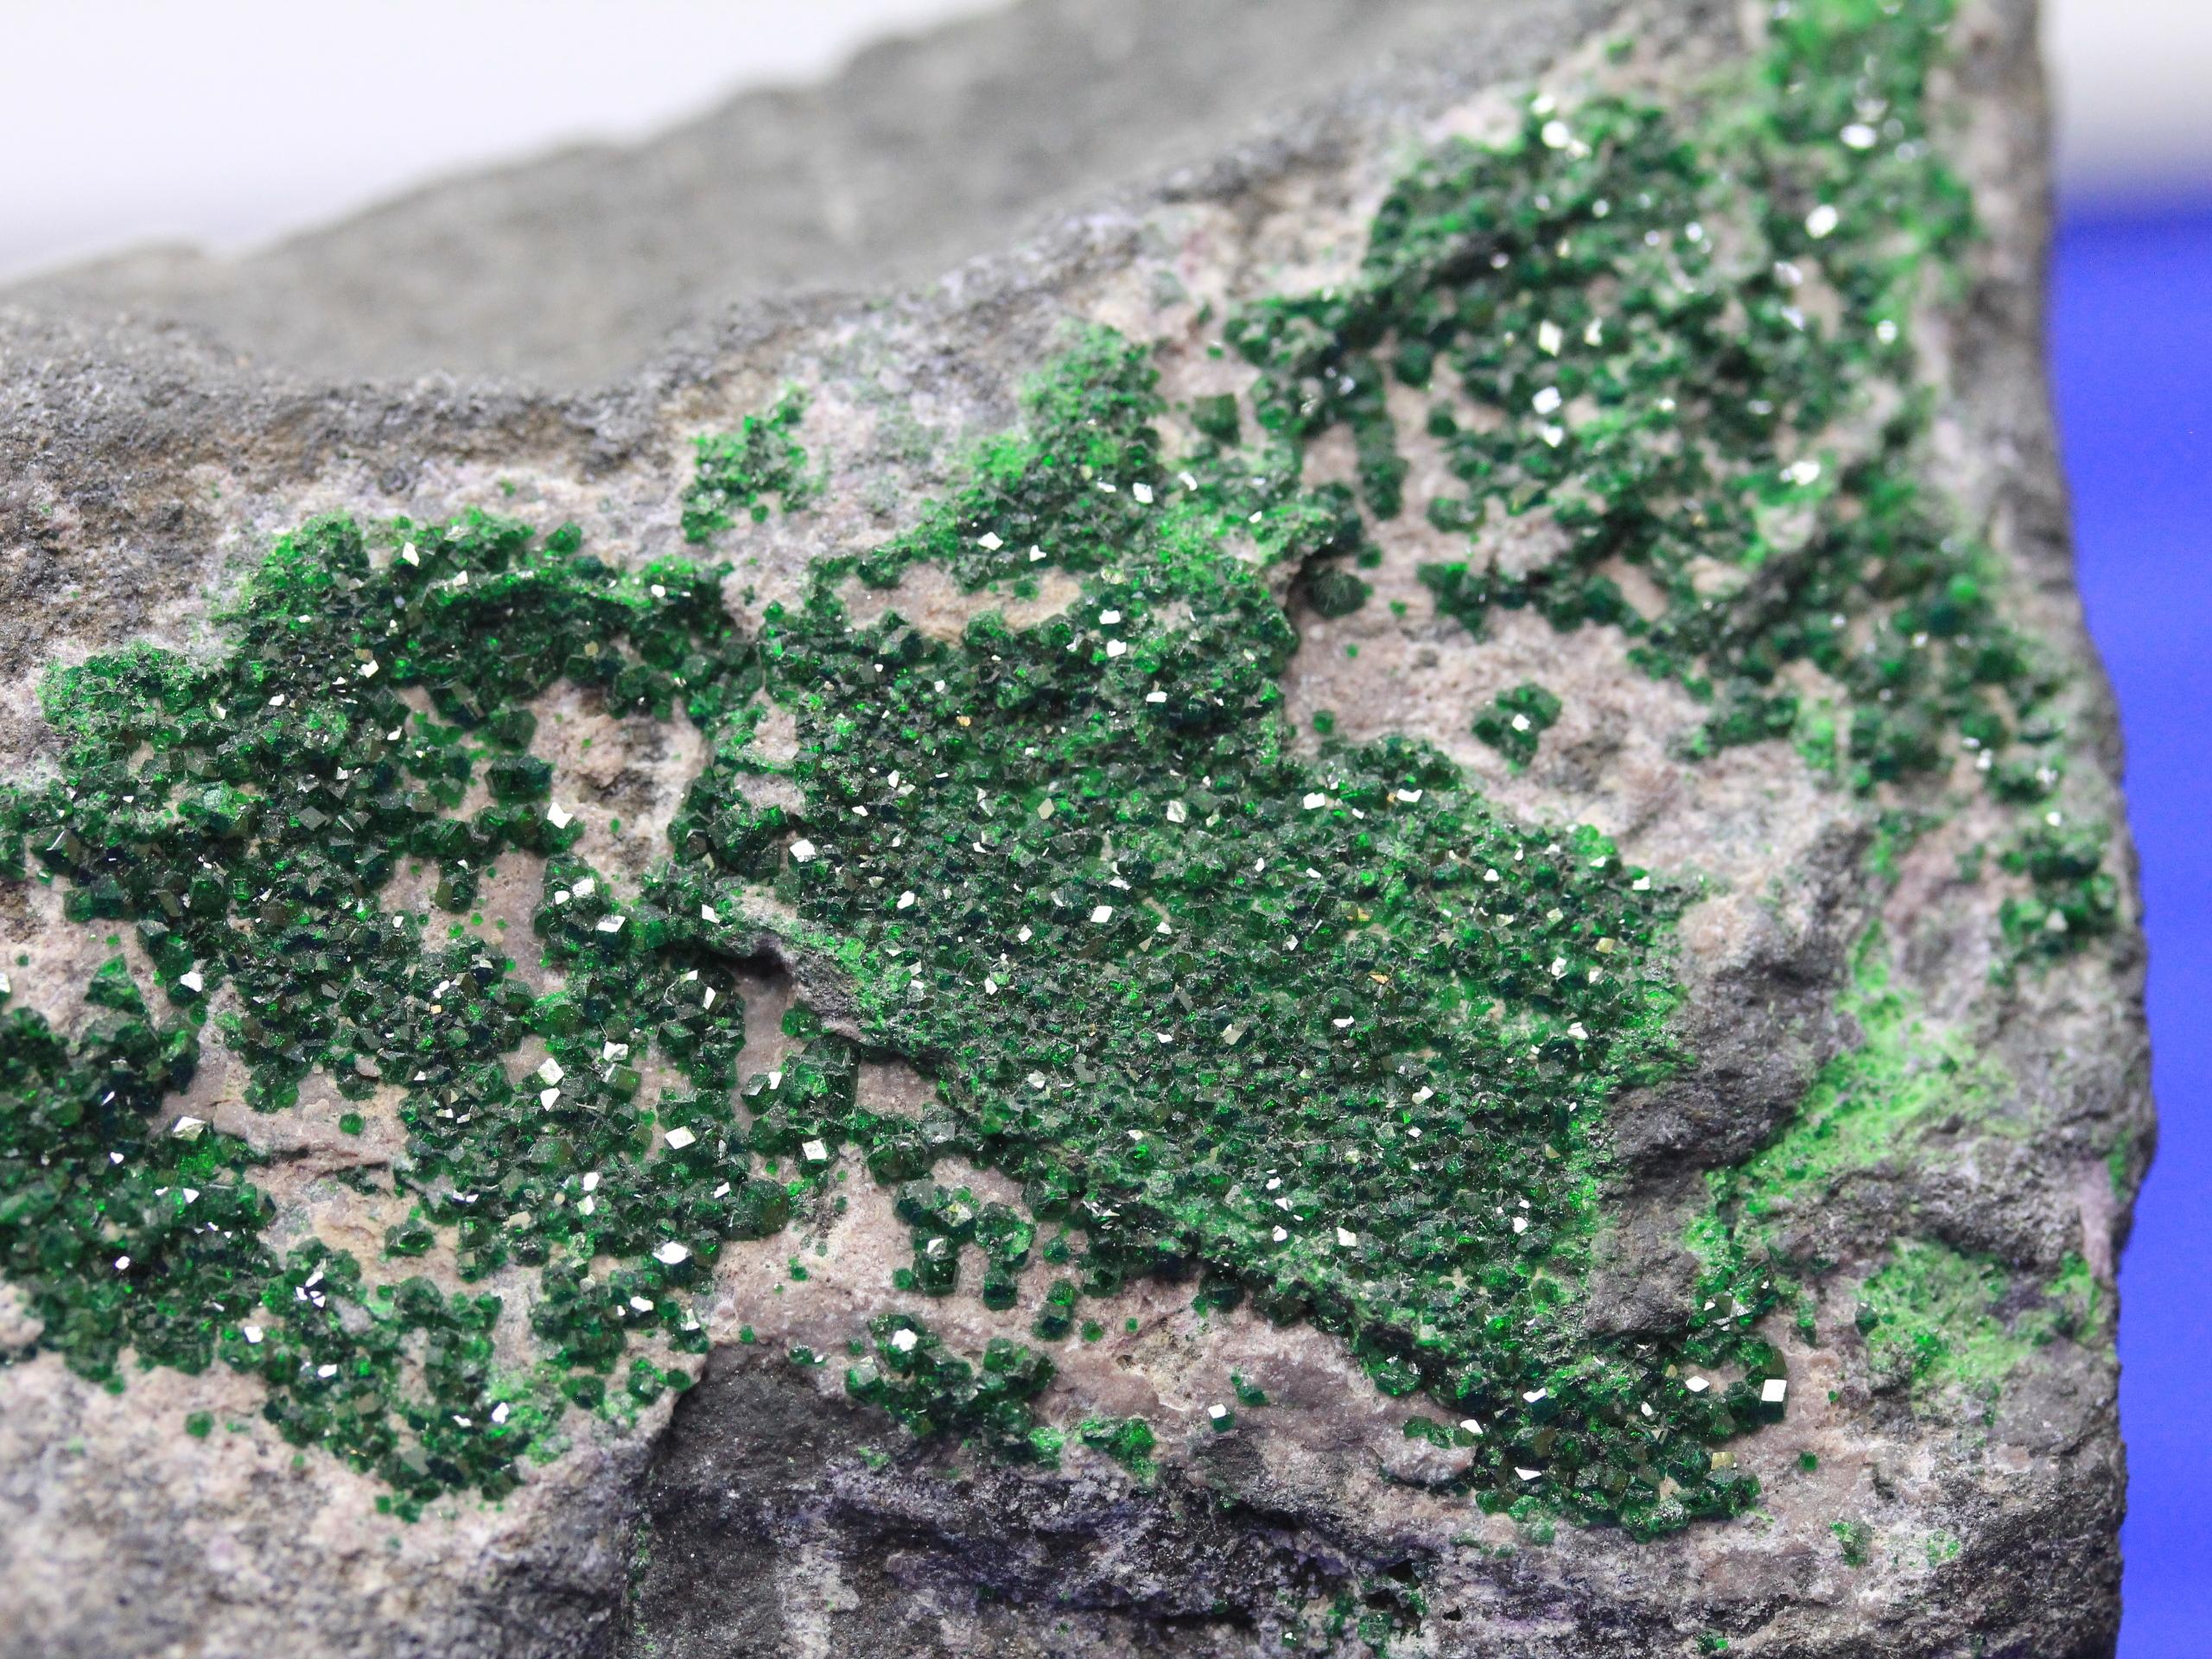 Emerald green uvarovite